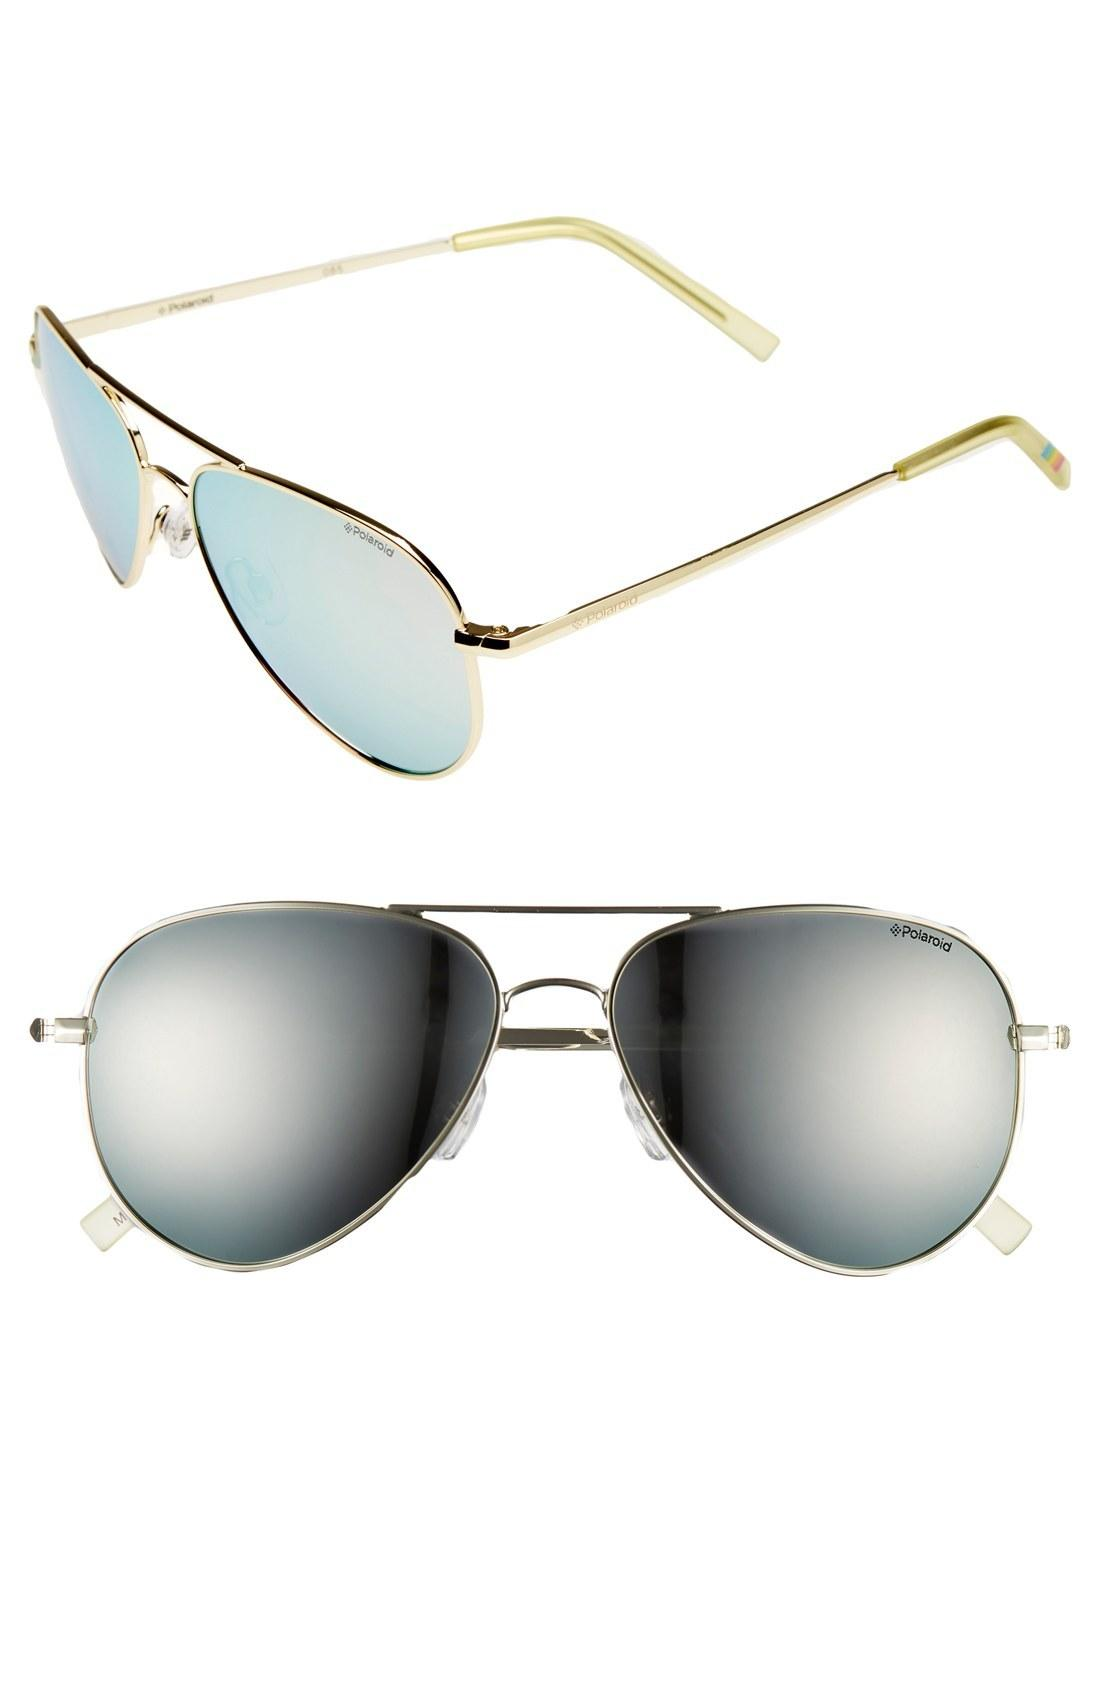 4bc4181d0 Polaroid 56Mm Polarized Aviator Sunglasses - Gold/ Silver Mirror/ Polarized